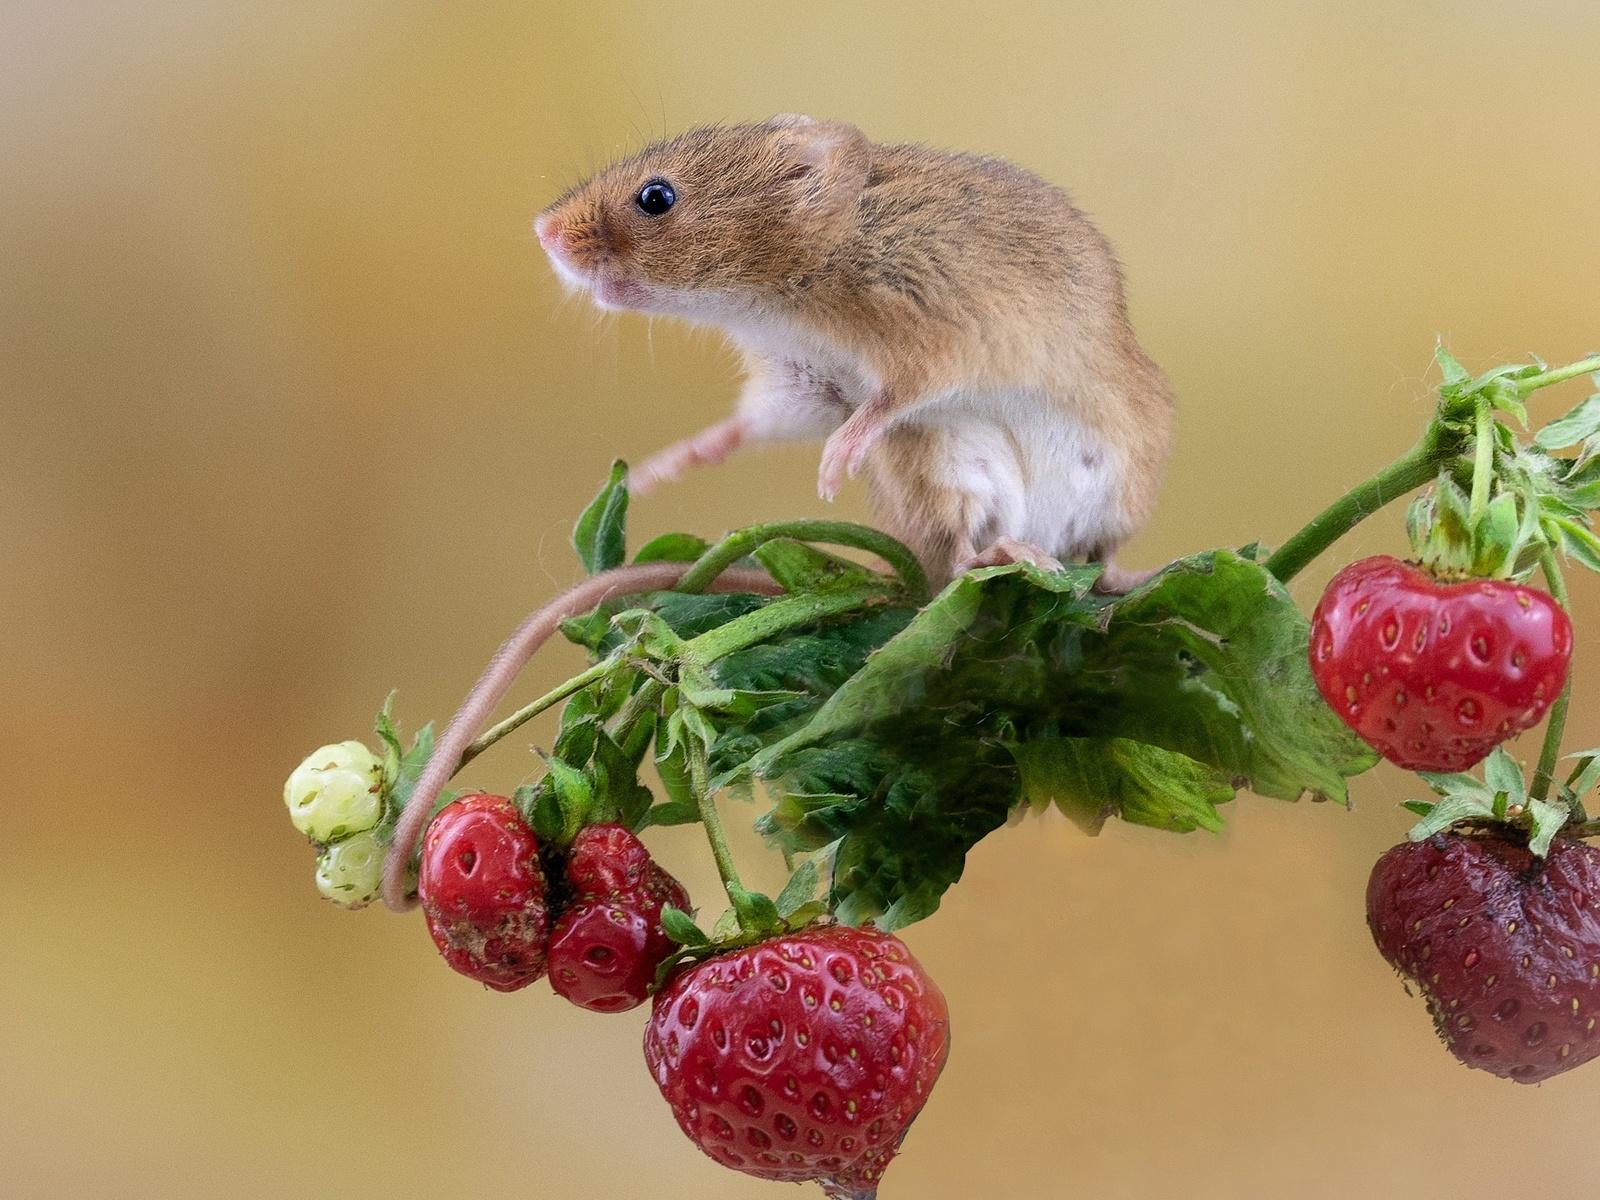 зверёк, грызун, мышь, ветка, ягоды, клубника